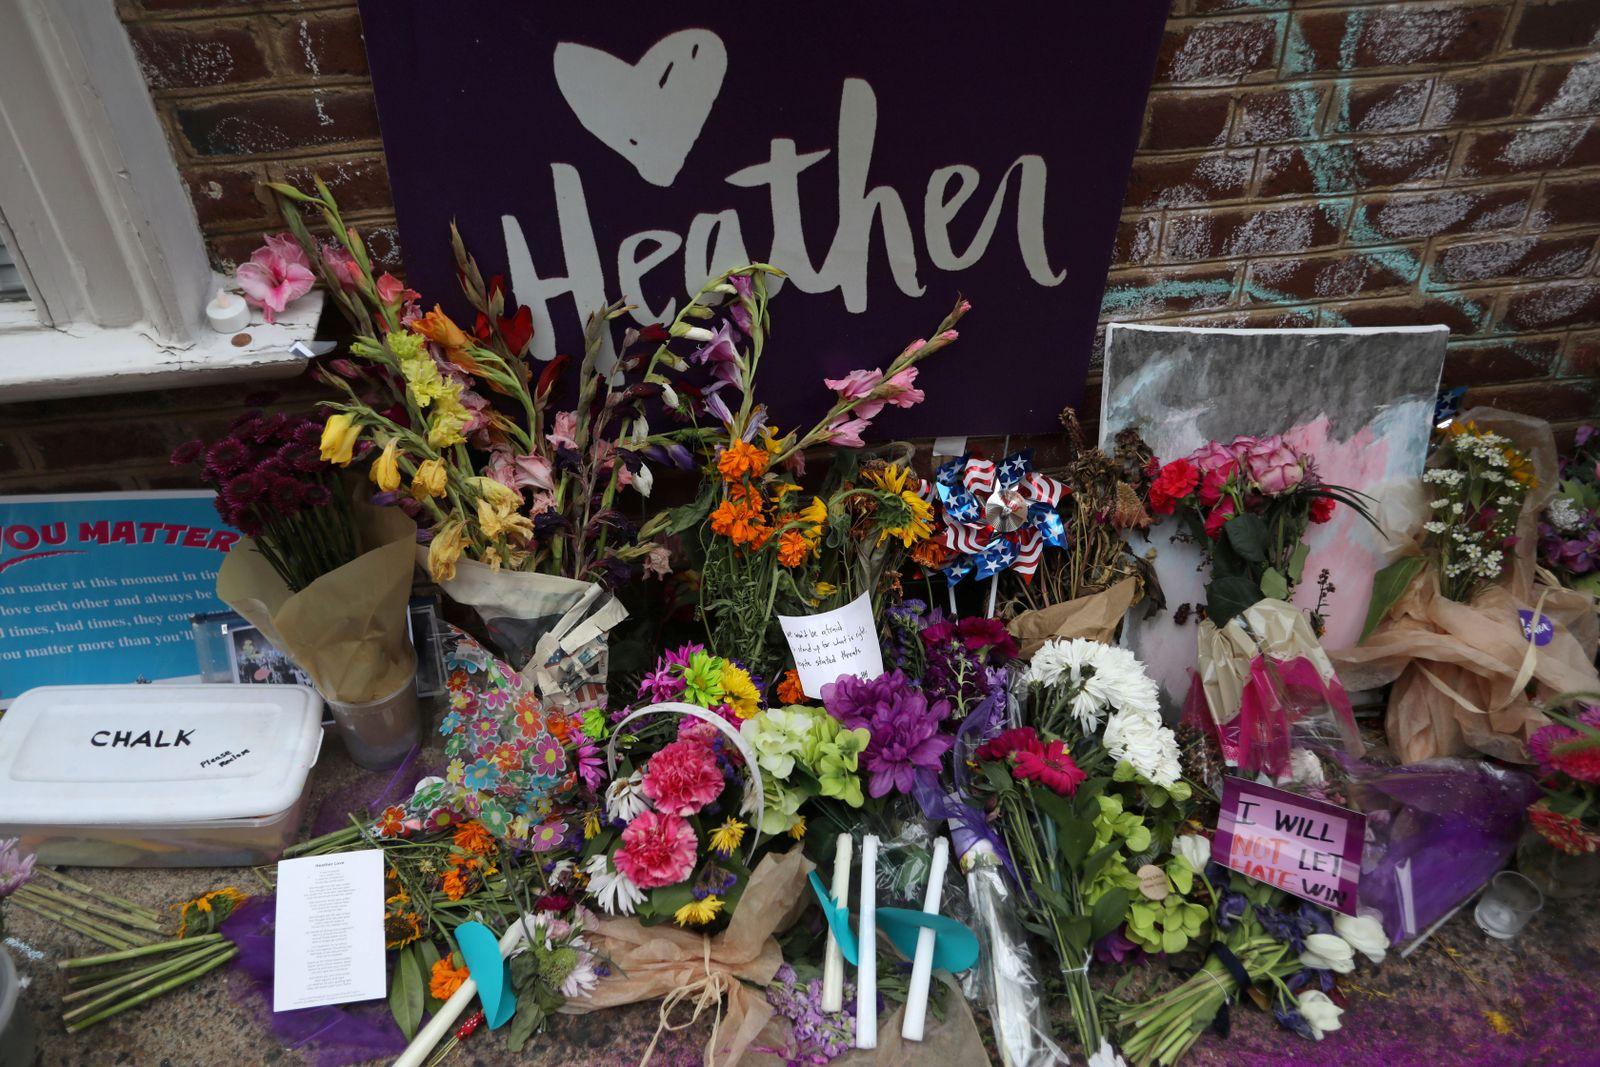 Heather Heyer Charlottesville